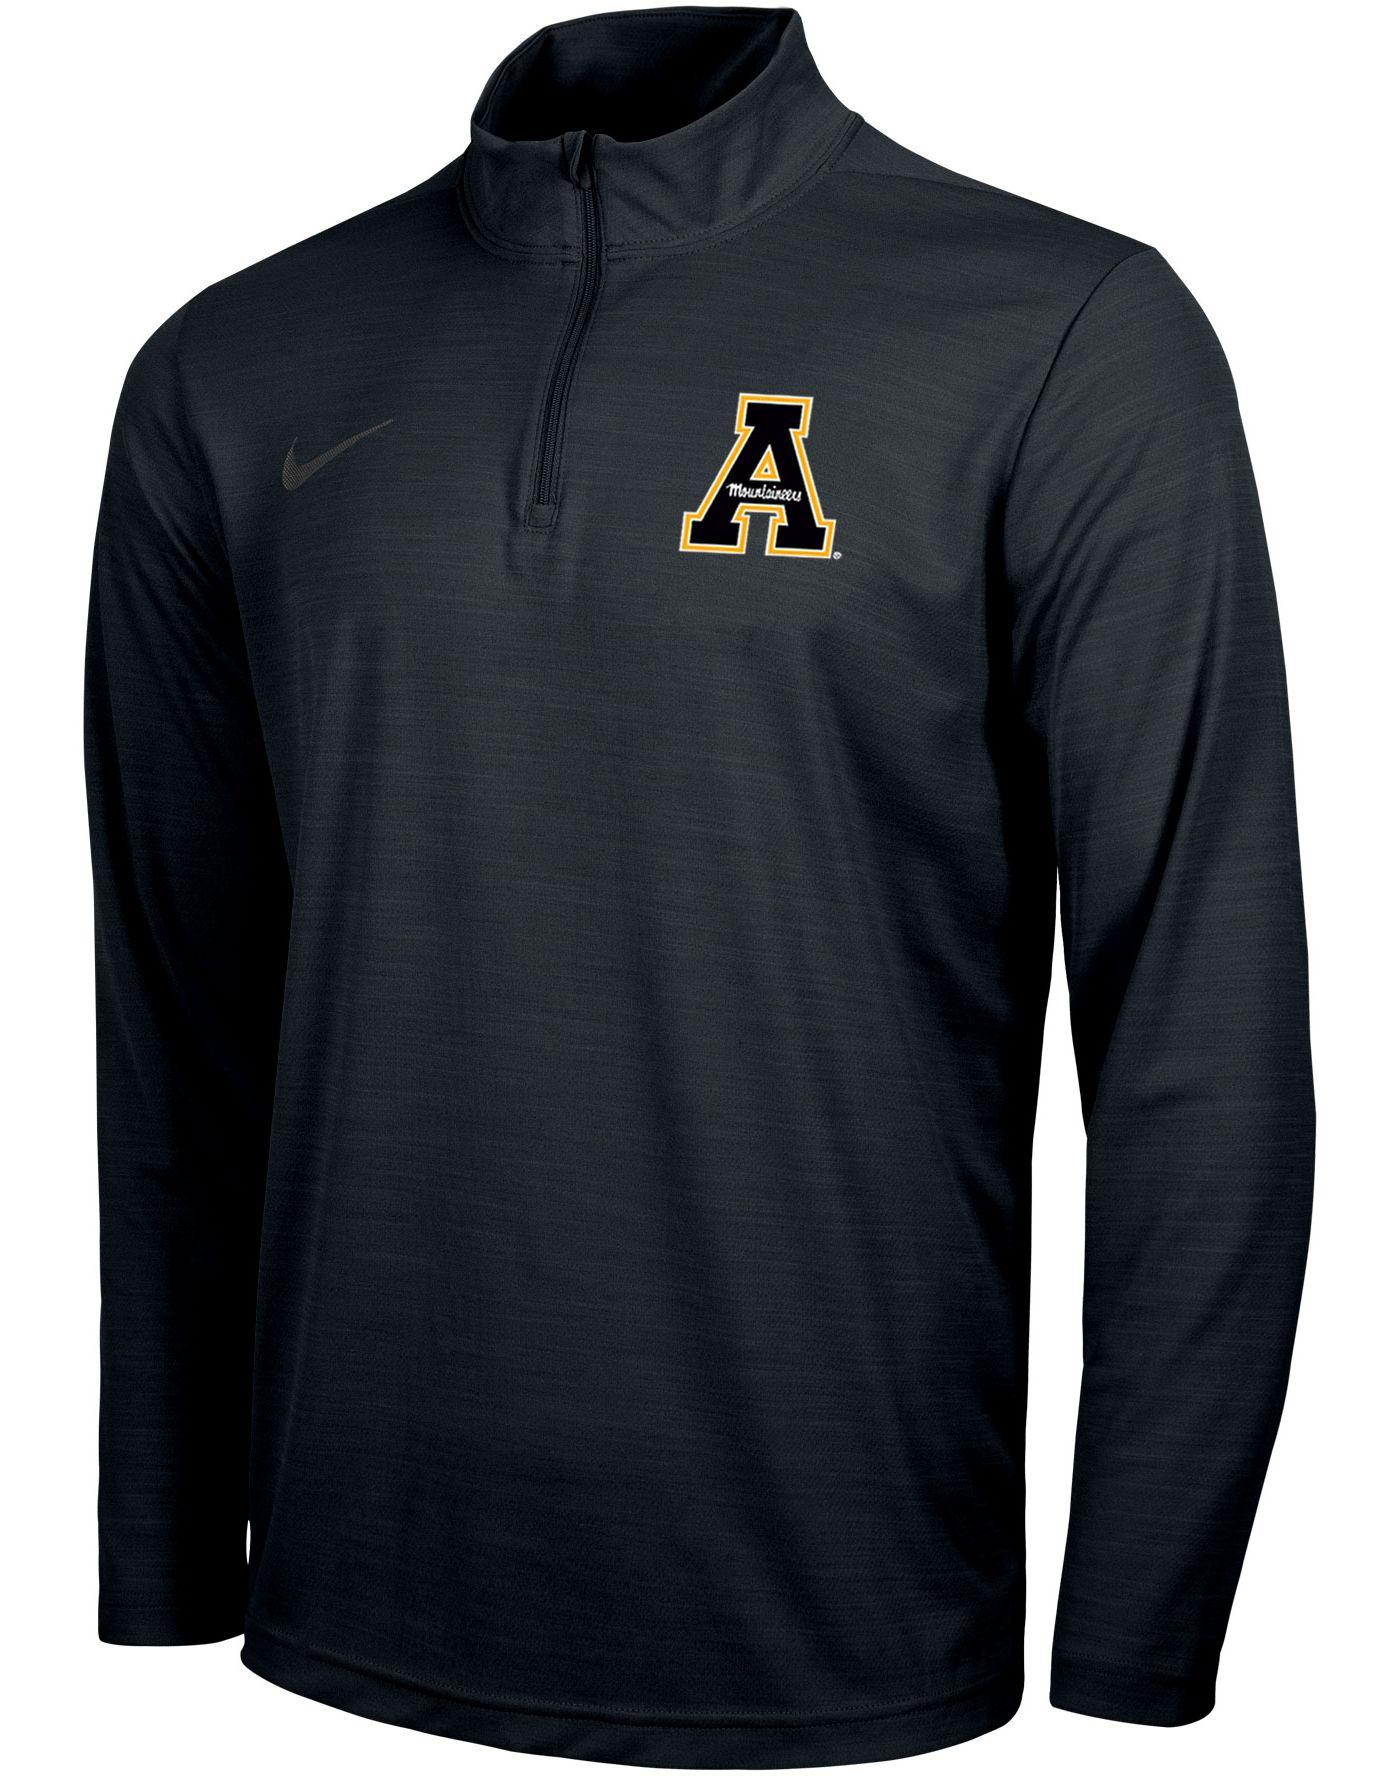 Nike Men's Appalachian State Mountaineers Intensity Quarter-Zip Black Shirt